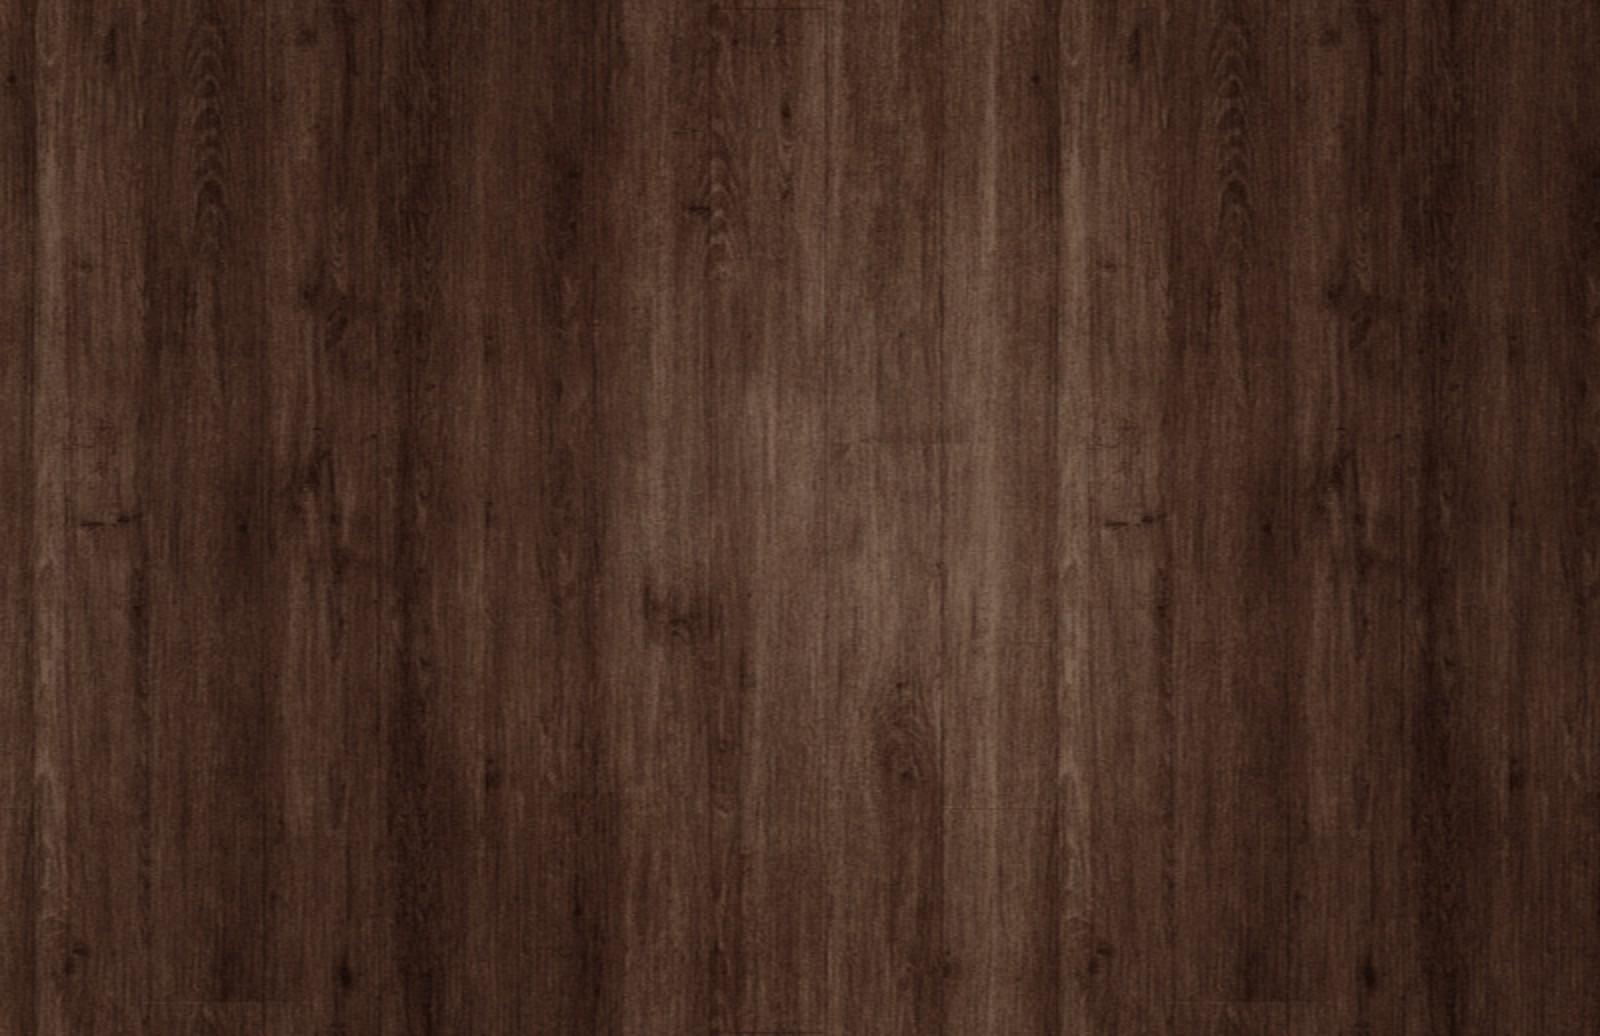 Seamless Wood Textures Vol 2 Medialoot